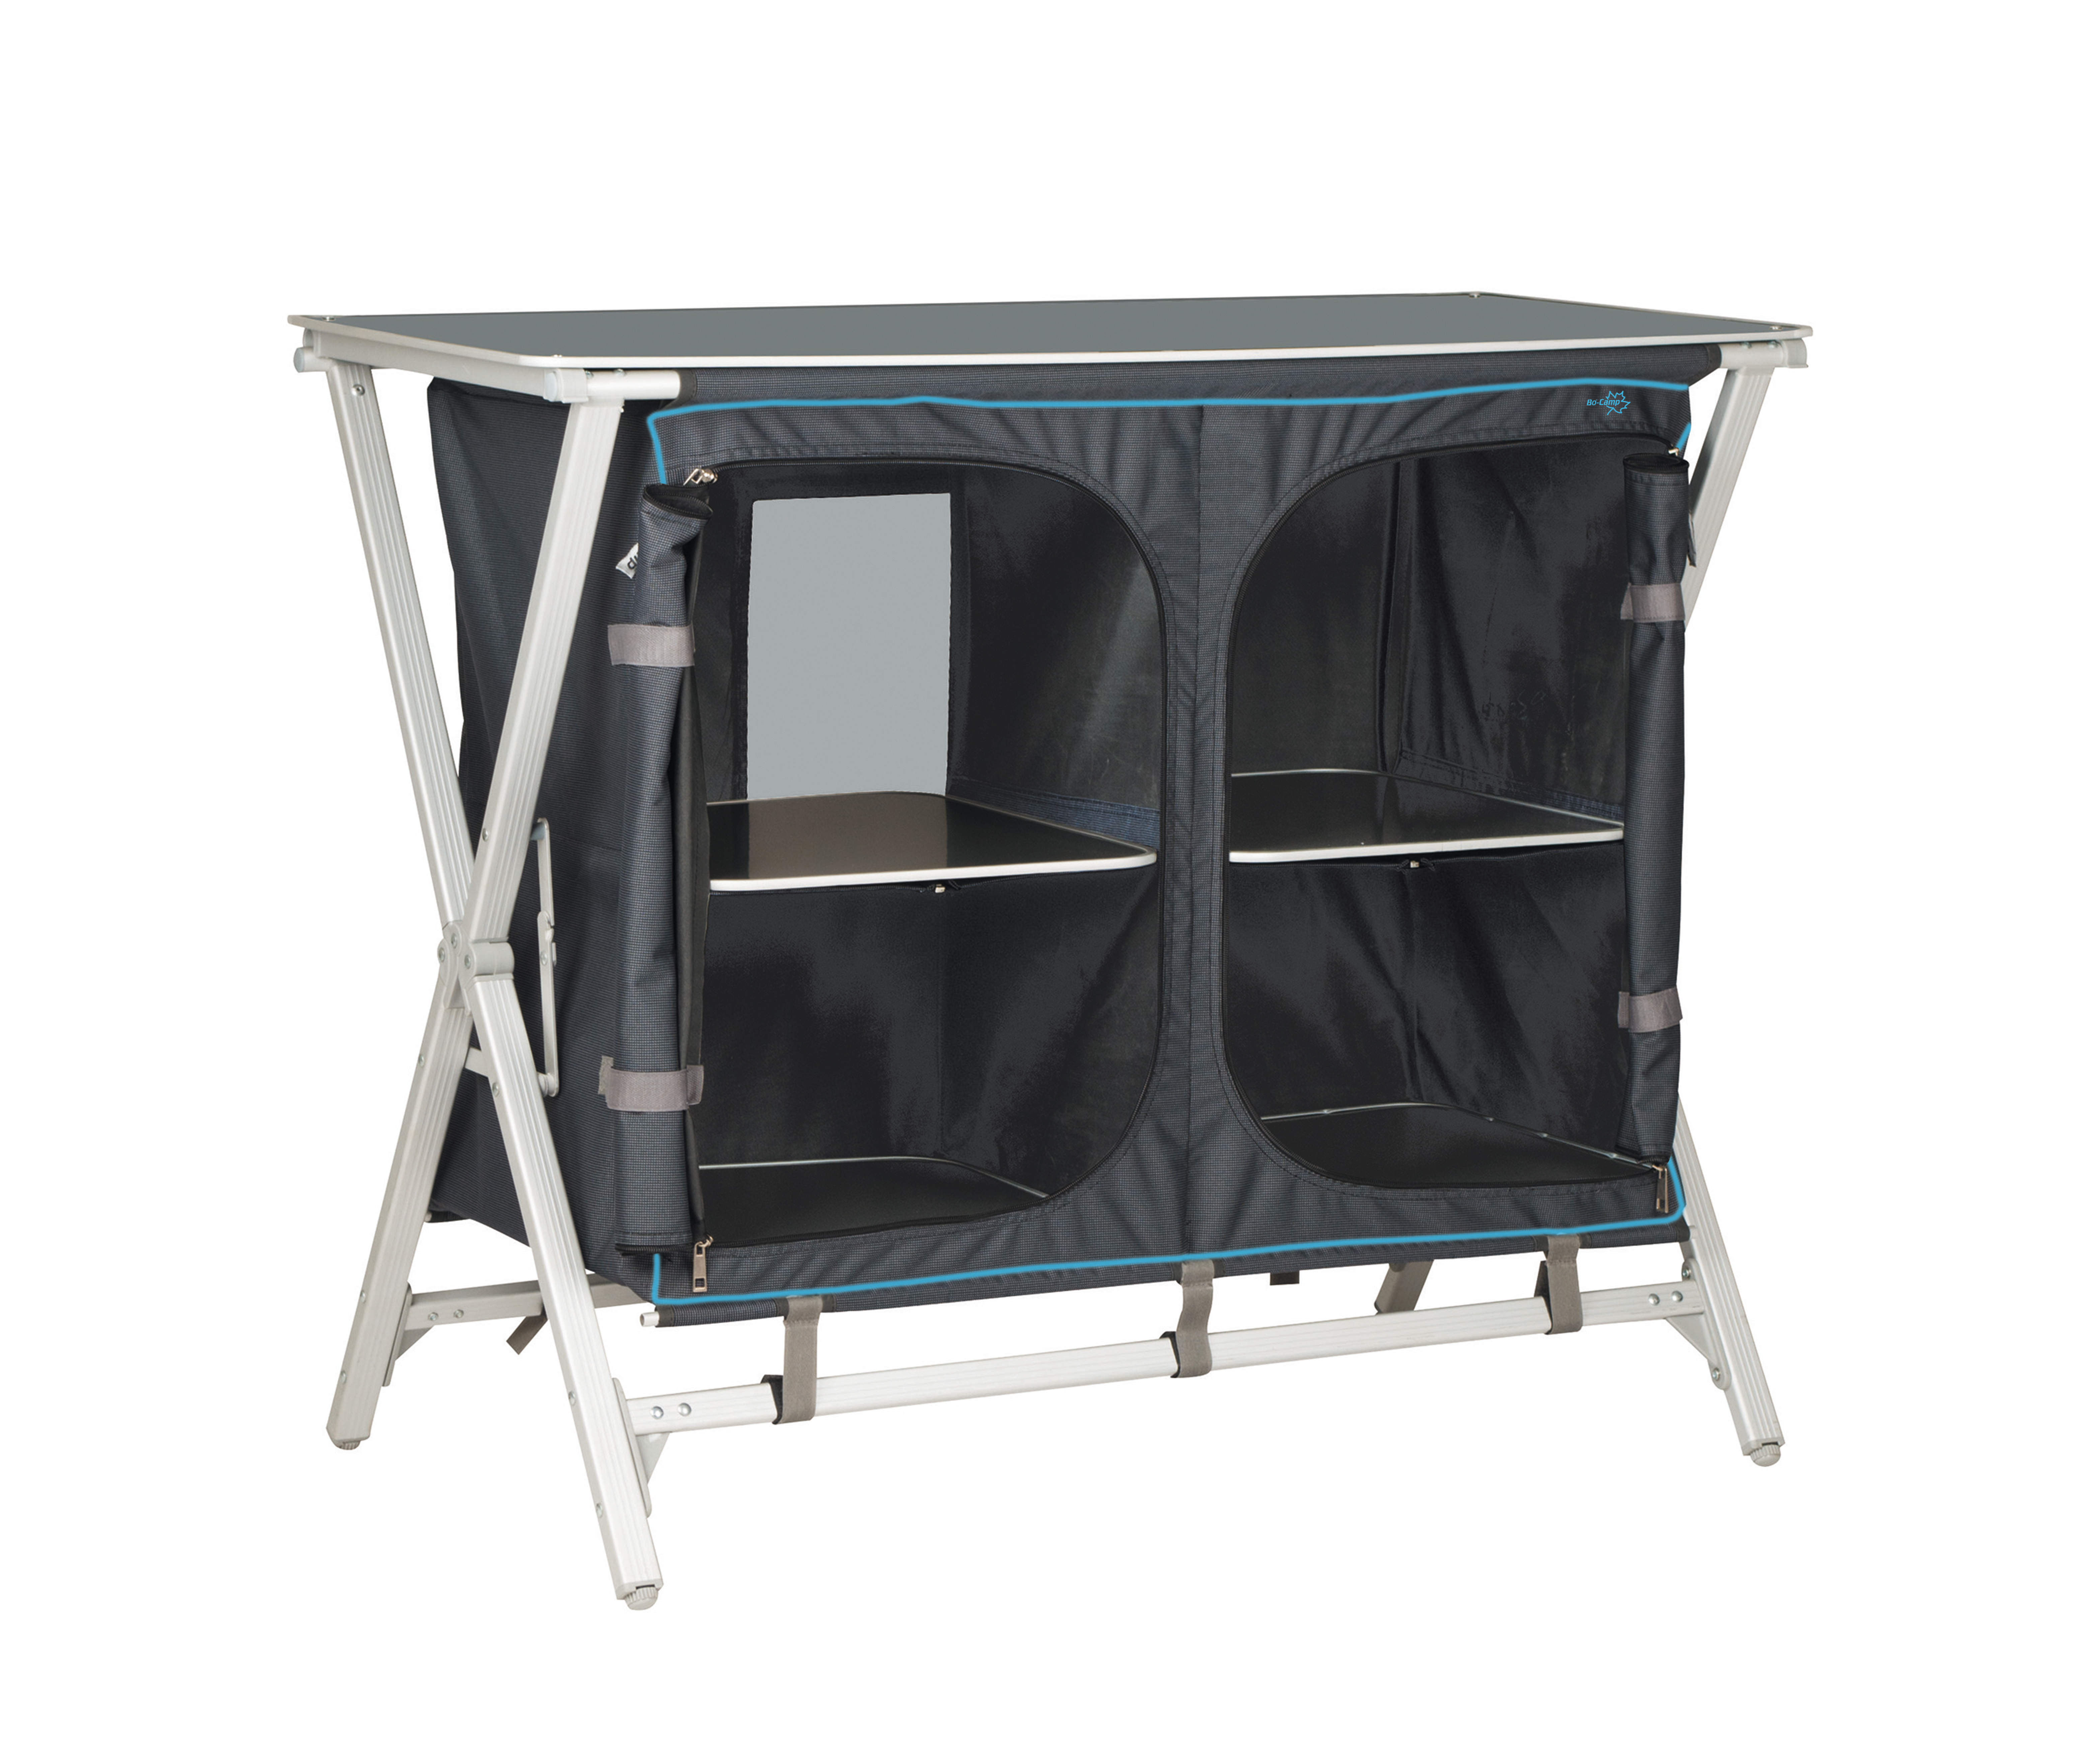 Camping Küchenschrank Easy-to-fold - Camping- & Outdoor-Zubehör